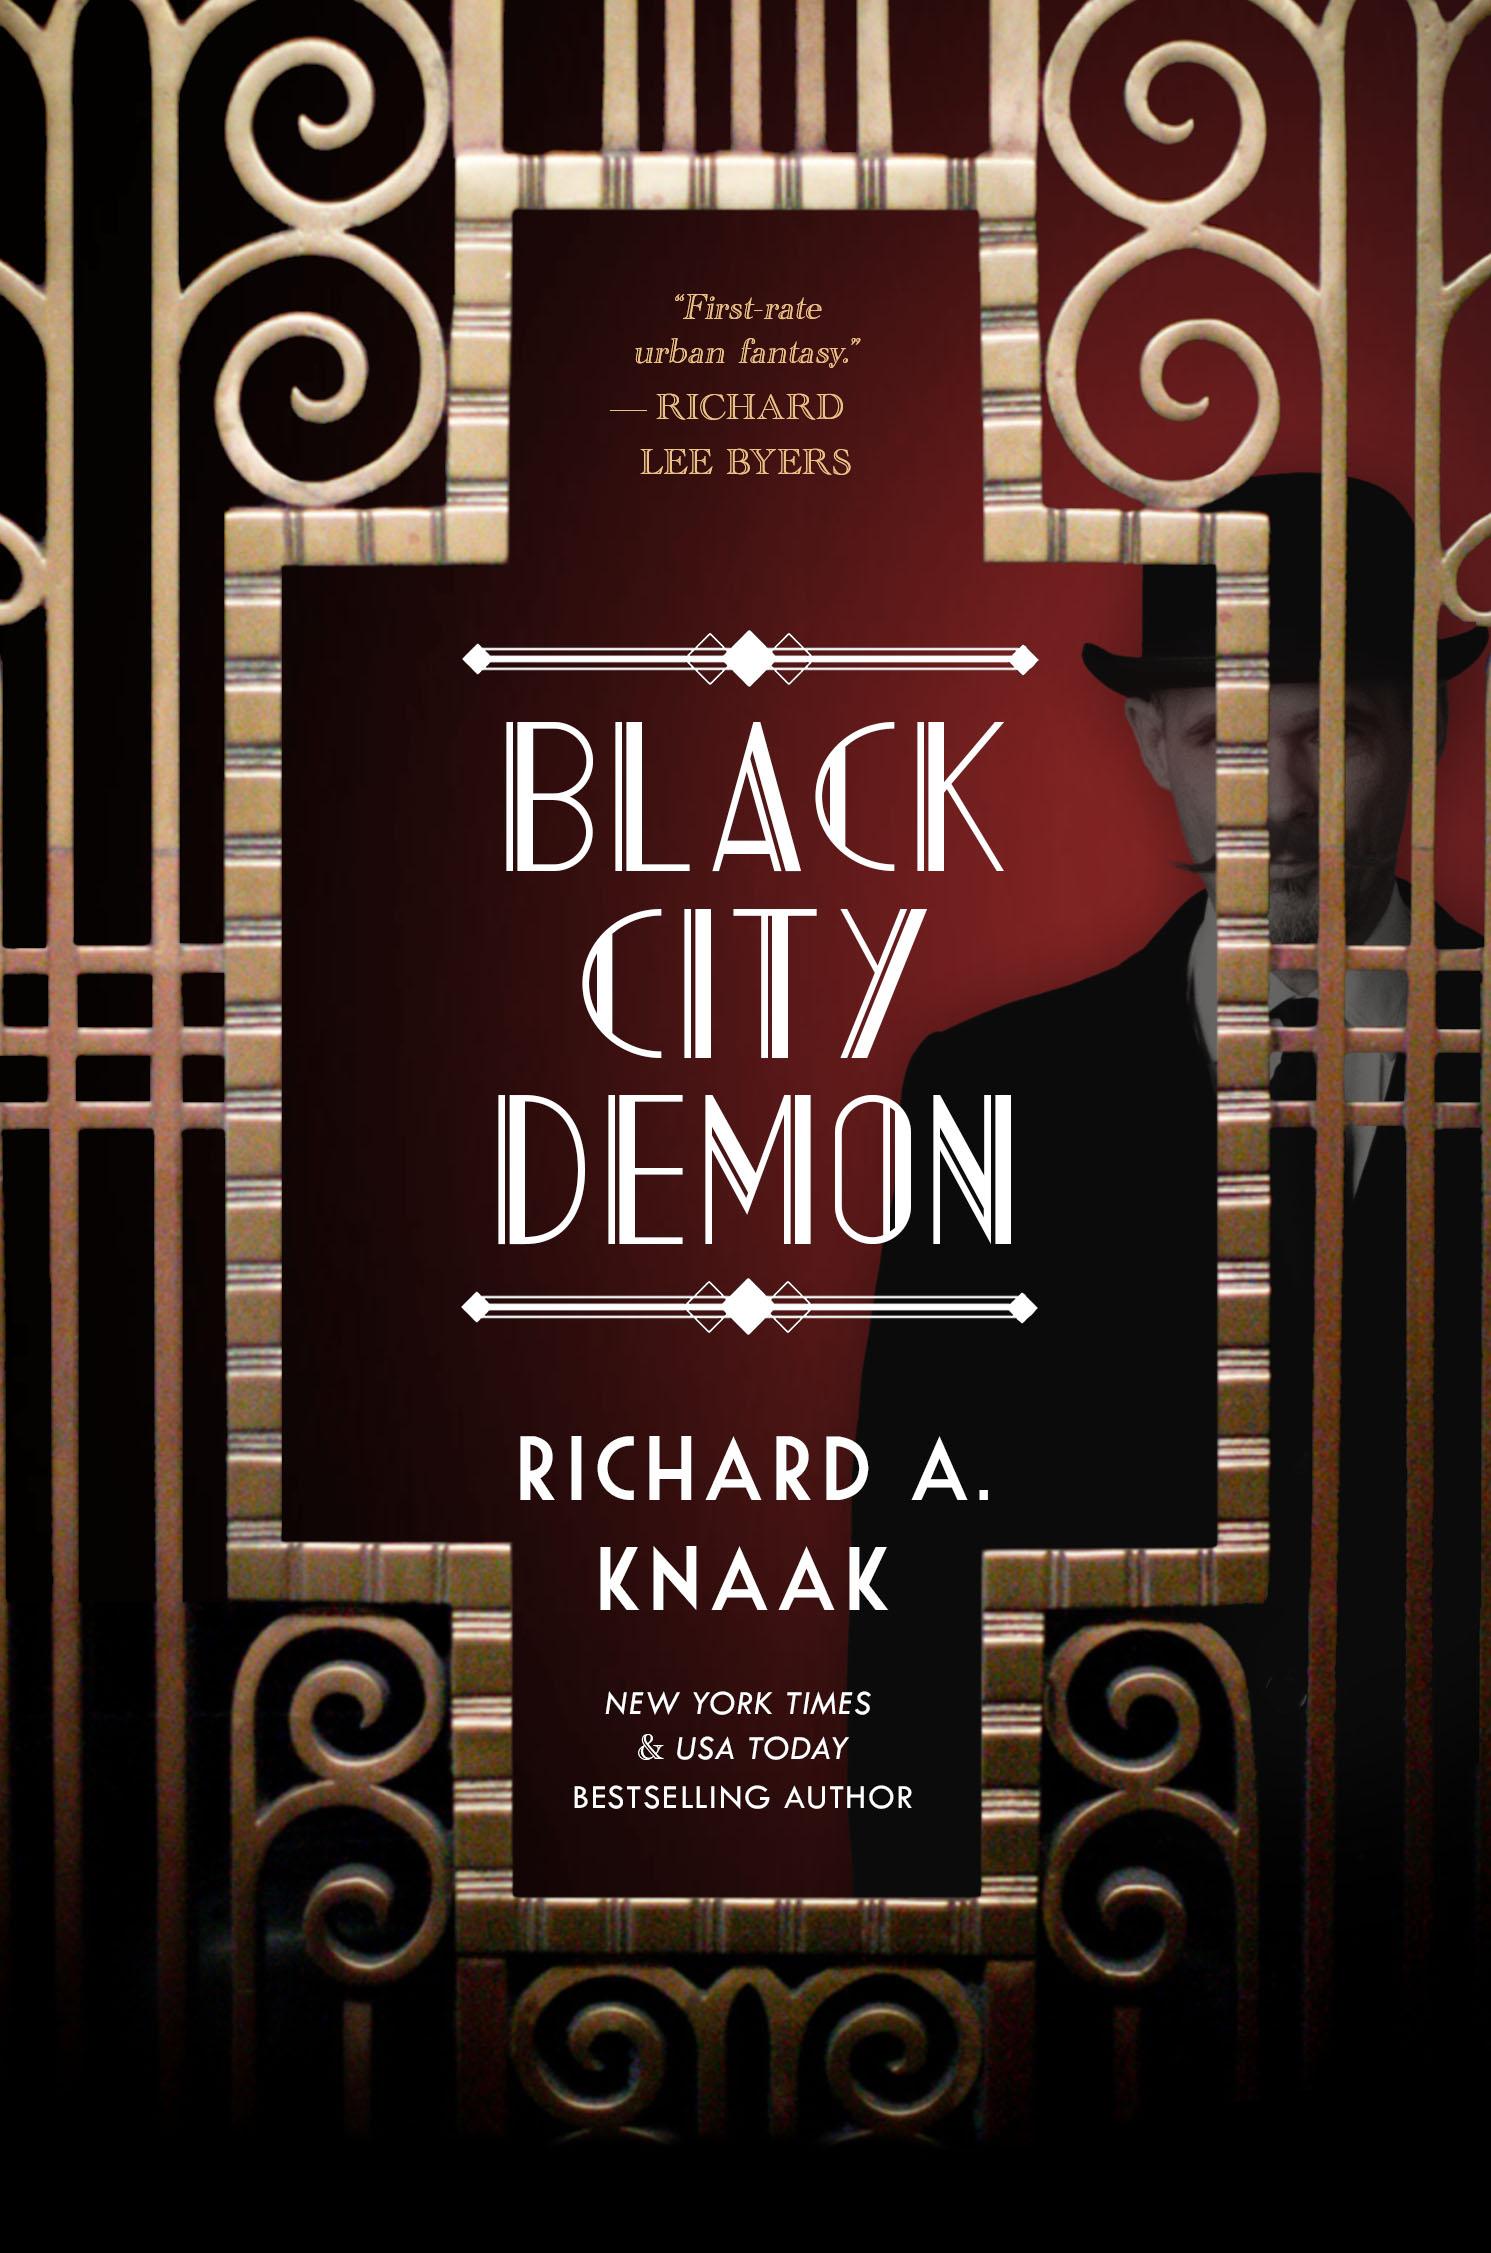 Black demons story library fucks video